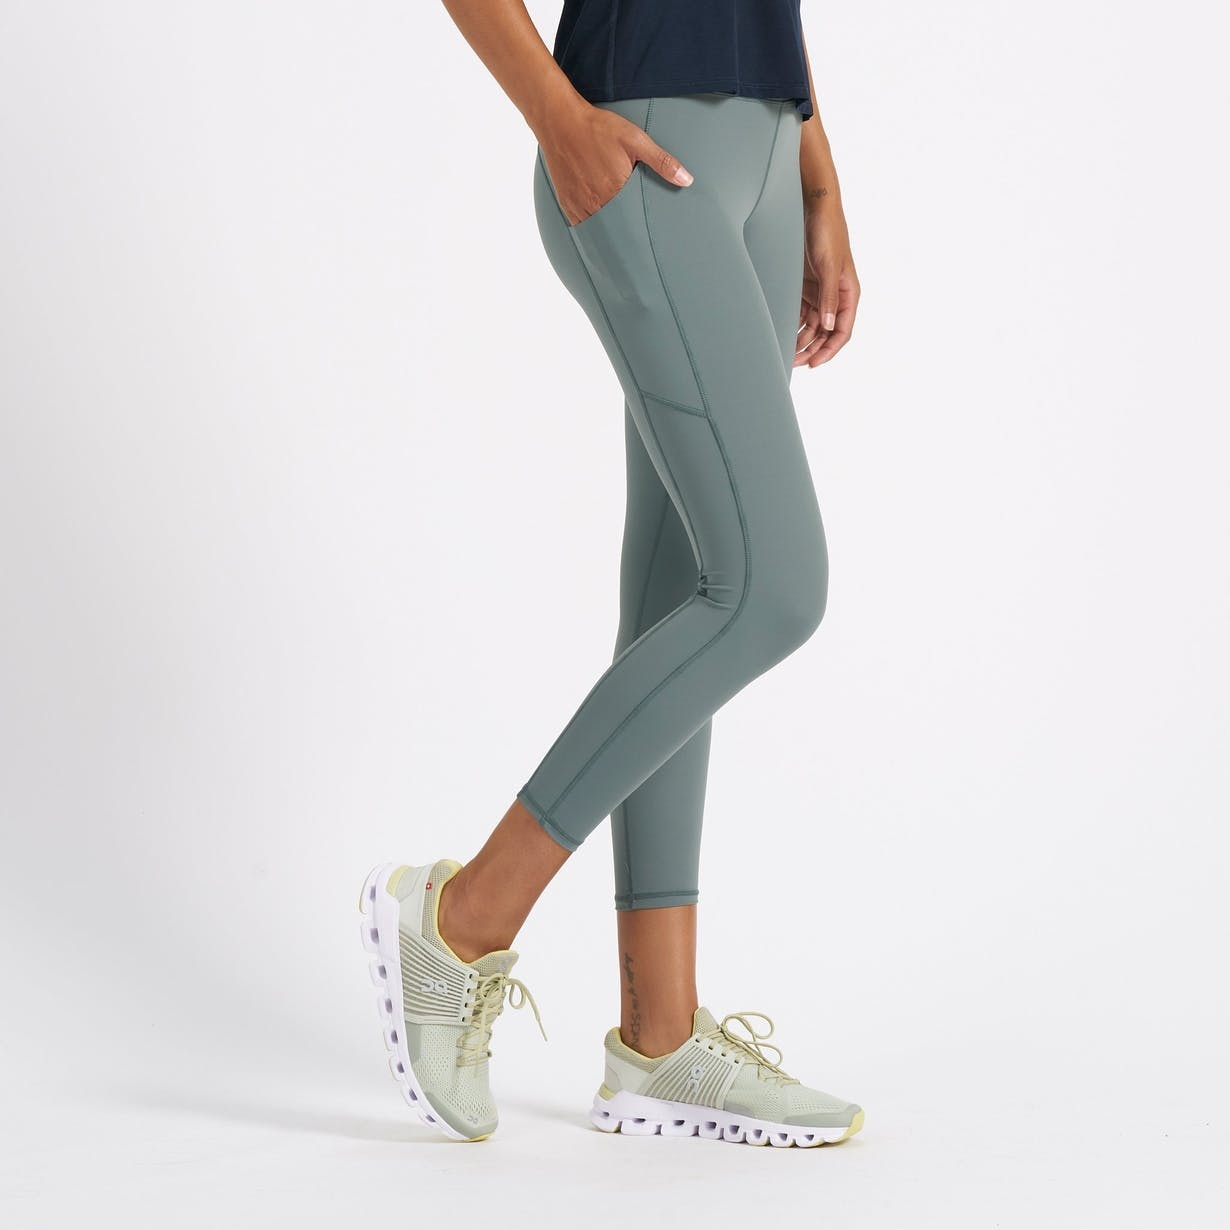 Vuori Vuori Women's Stride Legging